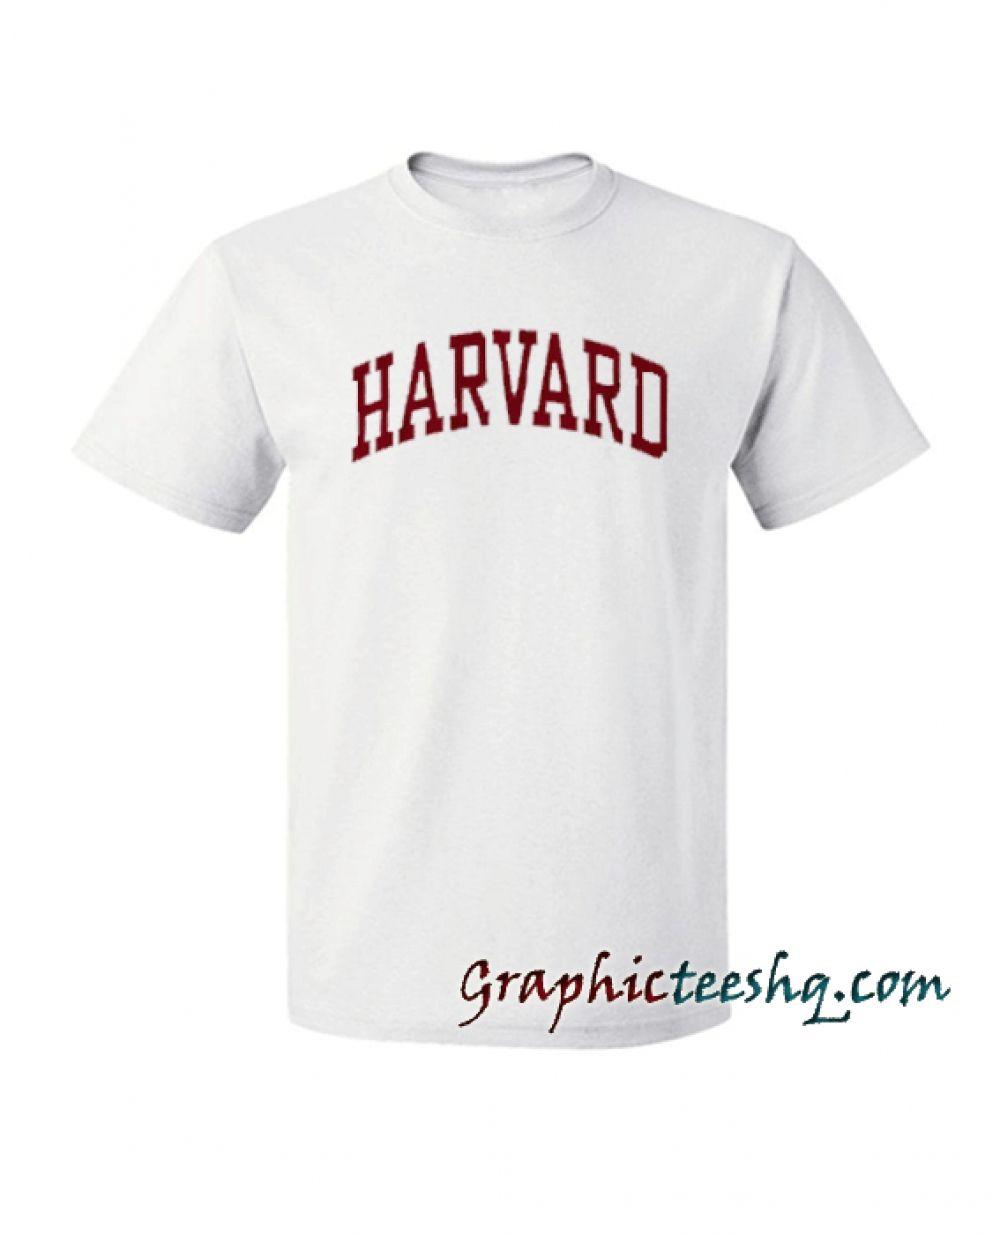 f4a2547b Harvard Tee Shirt Price: 13.50 #style #fashion #tshirts #tee  #tshirtdesign#instafashion #black #cute #art #amazing#funny #webstagram  #lol #hot ...